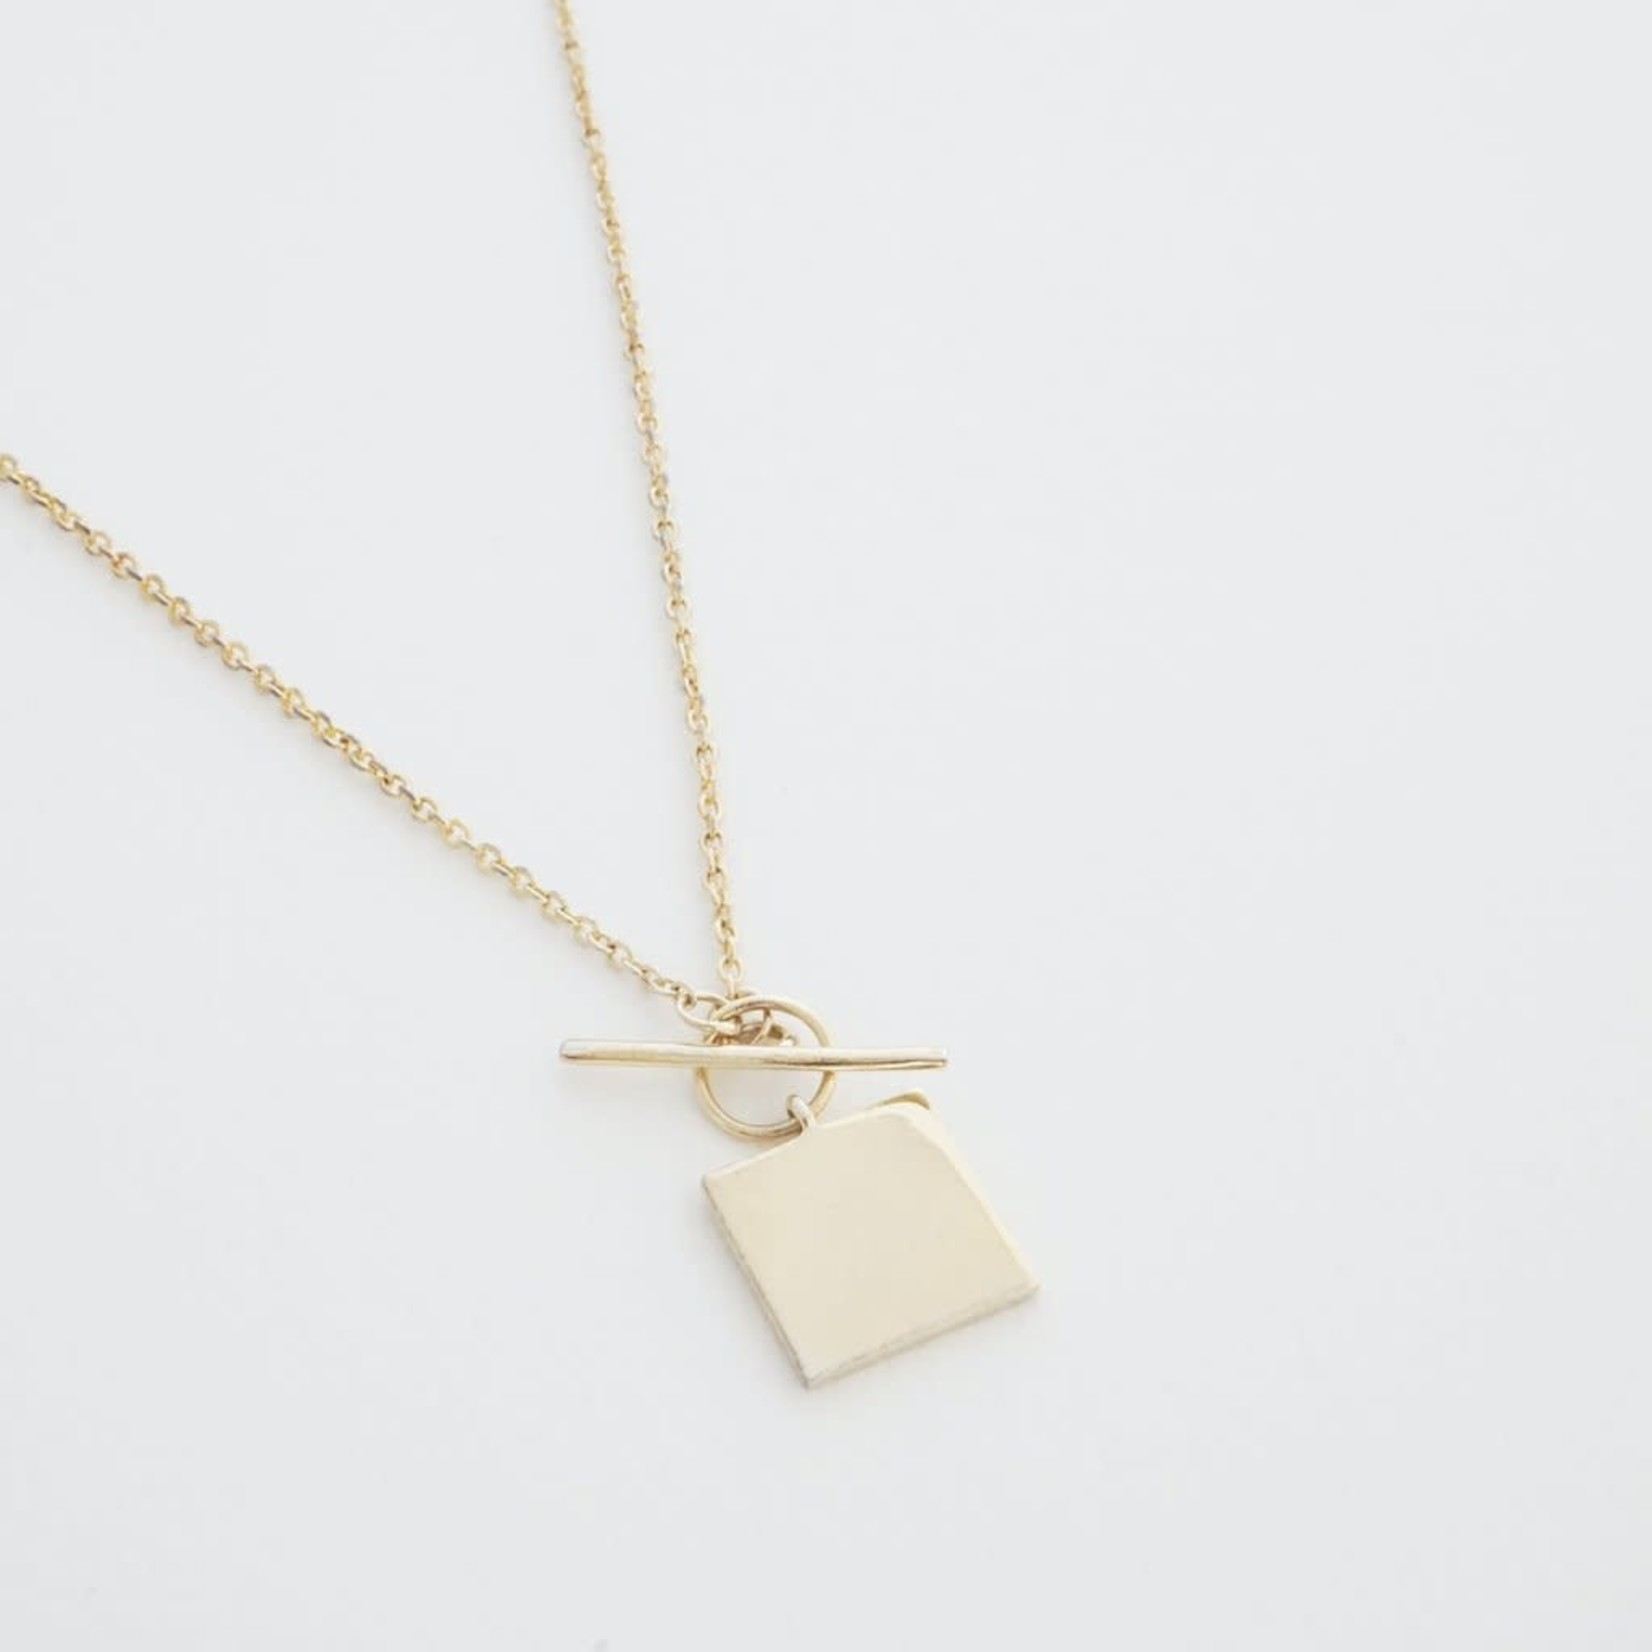 Honeycat Jewelry Honeycat Gwyneth Toggle Necklace